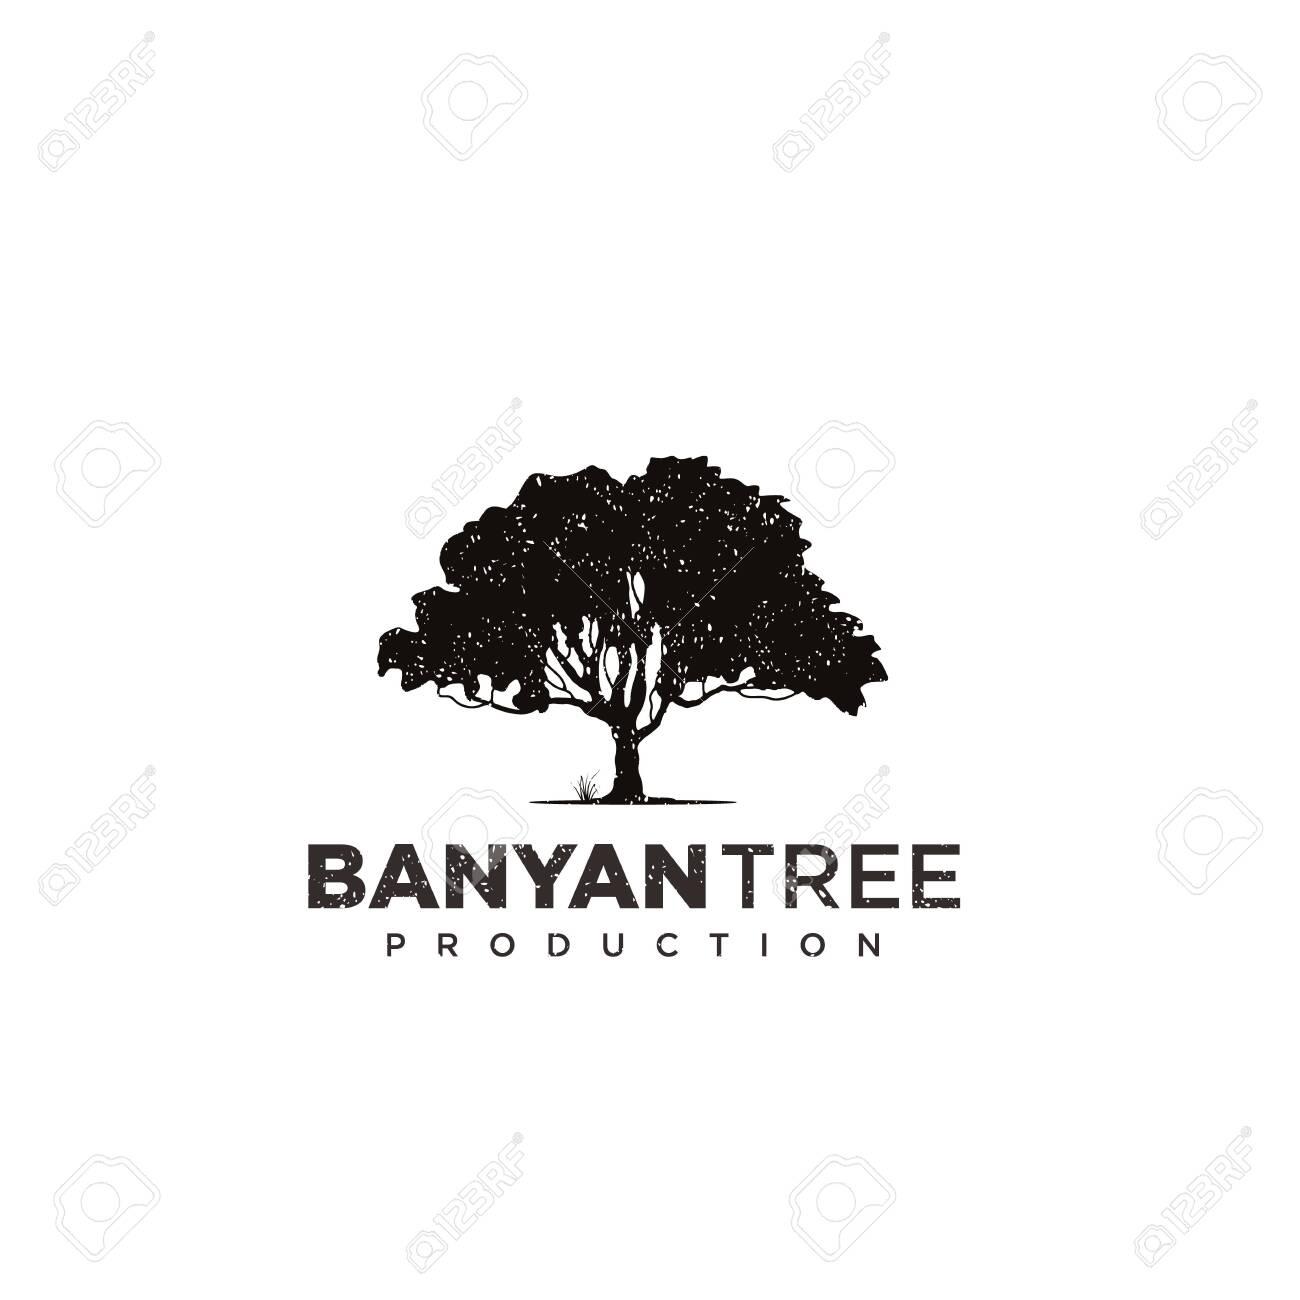 Banyan Tree Logo Design Template Royalty Free Cliparts Vectors And Stock Illustration Image 145193599